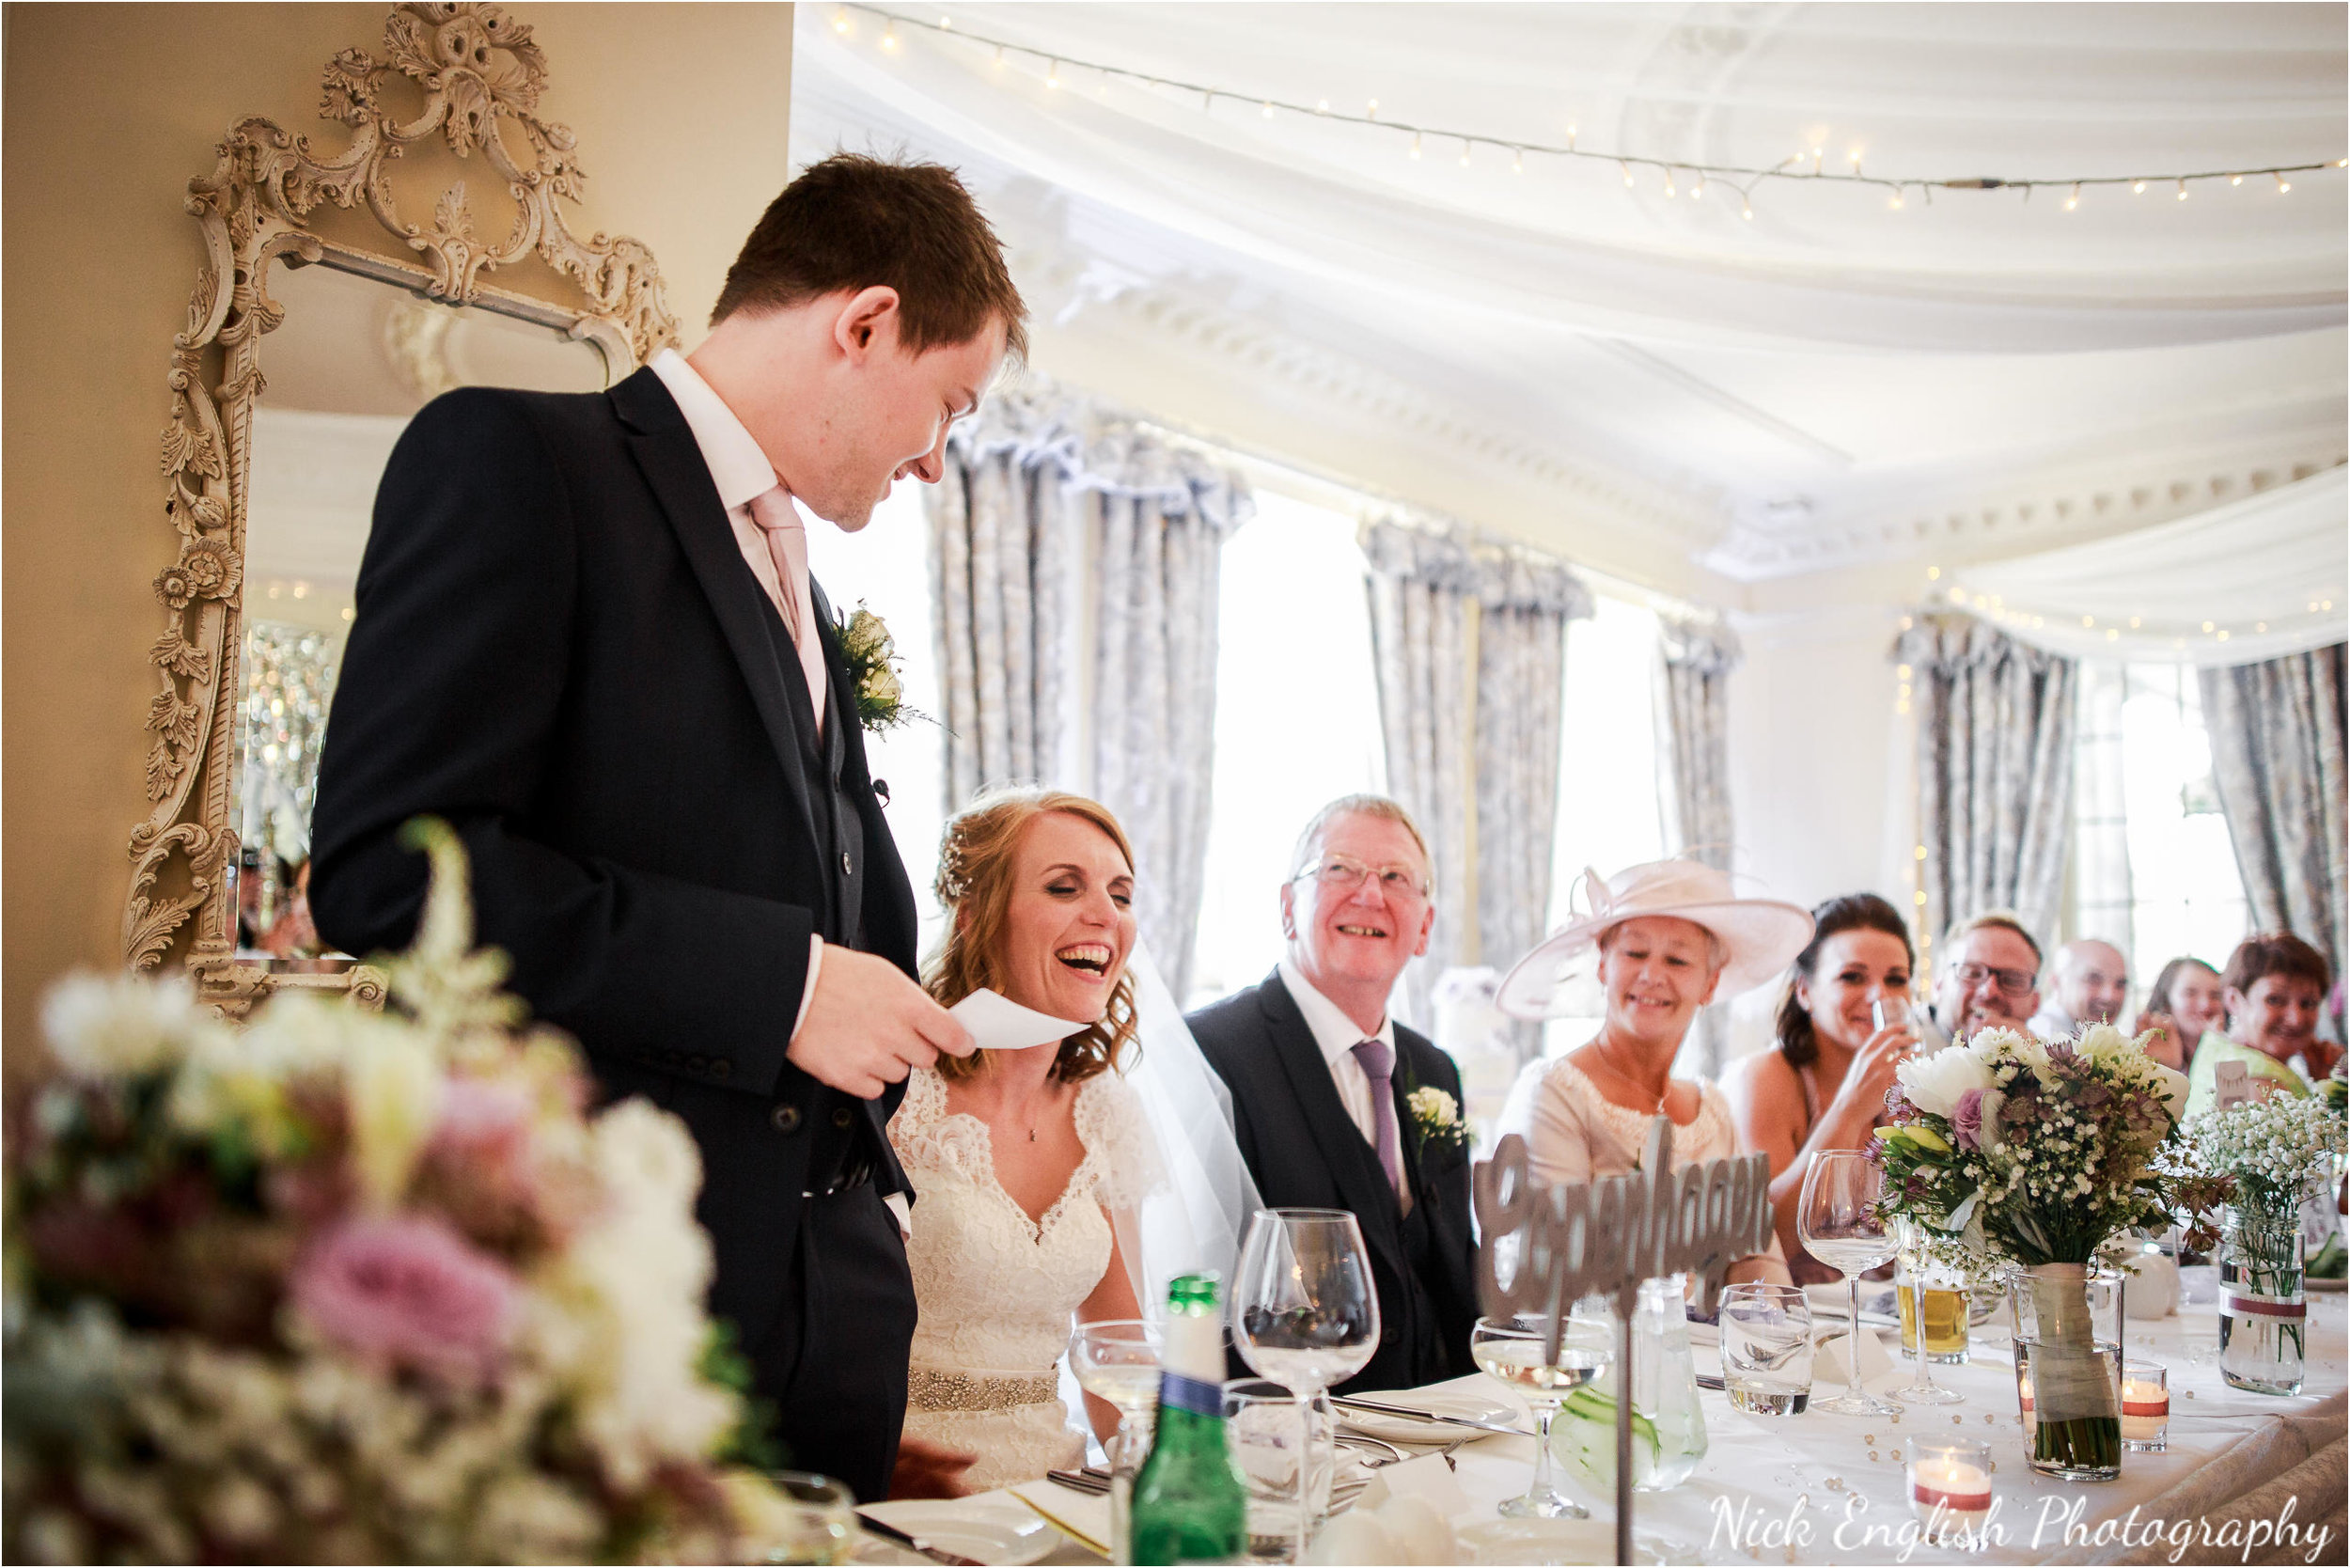 Alison James Wedding Photographs at Eaves Hall West Bradford 177jpg.jpeg